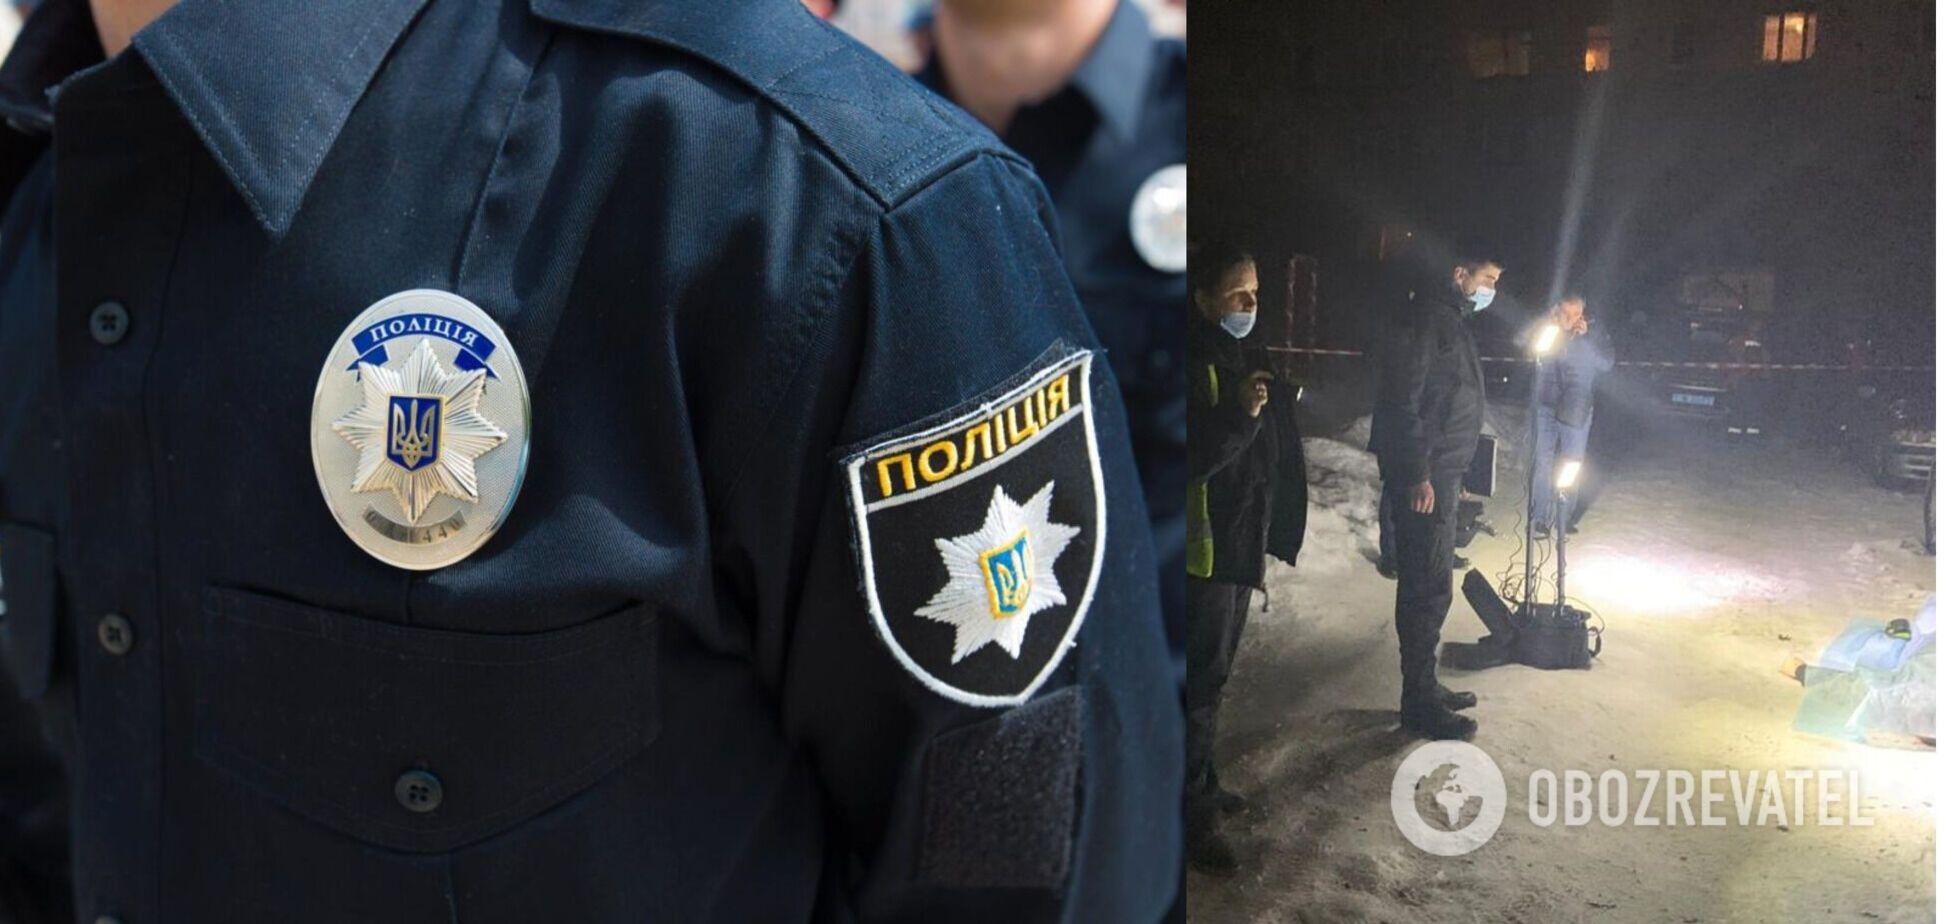 На Львовщине мужчина подорвал гранату, убив себя и знакомого: все детали, фото и видео ЧП